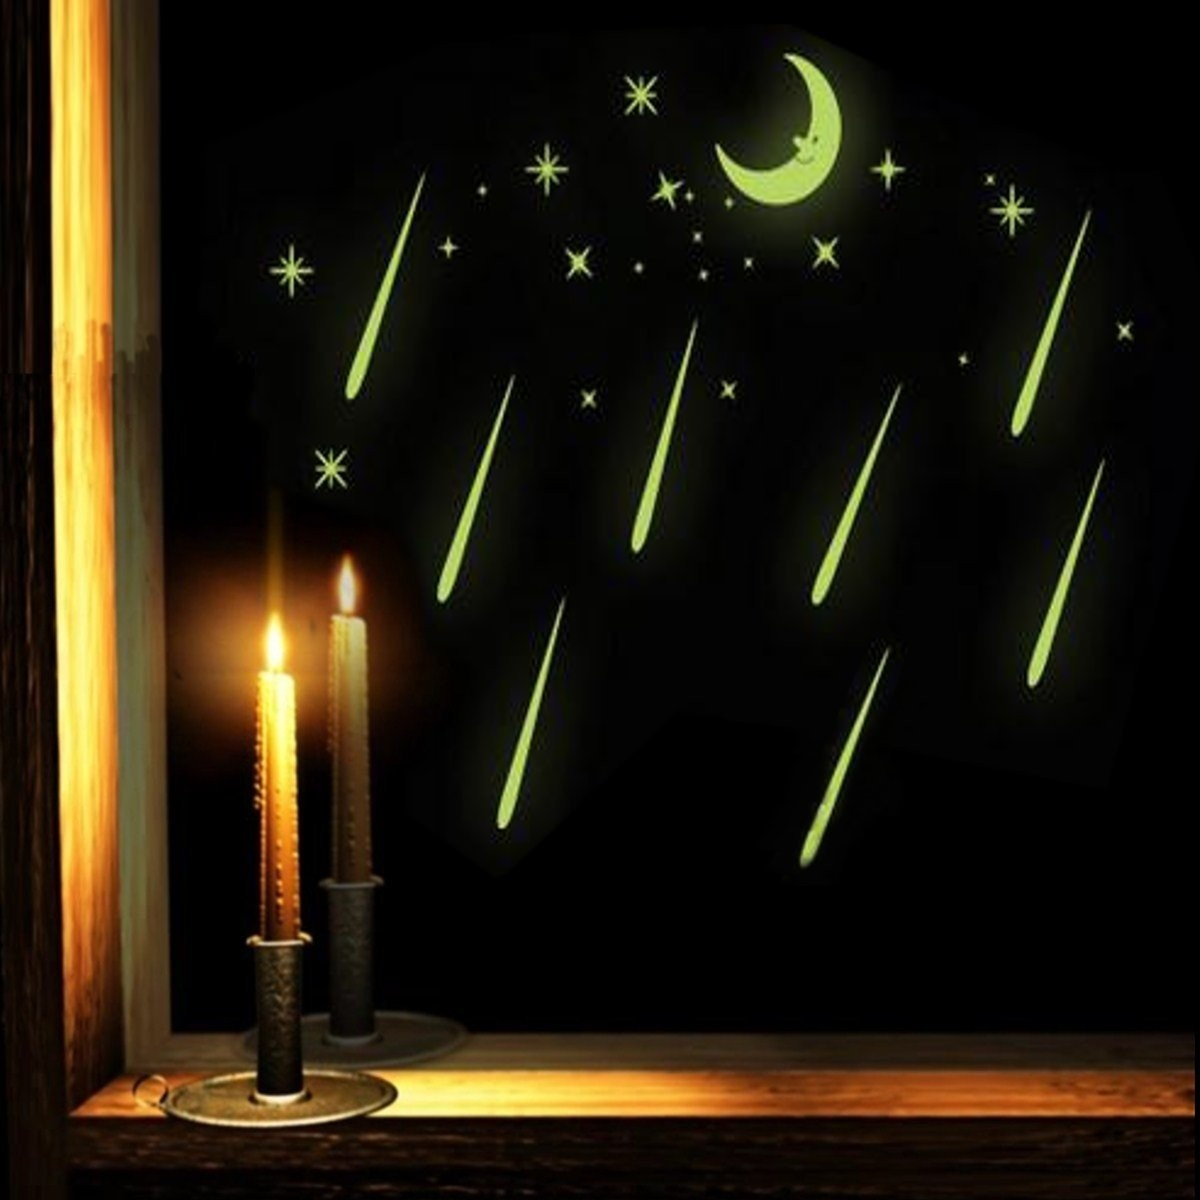 Meteor Shower Luminous Light Moon&Star Wall Stickers Decals Home Home Decor safe